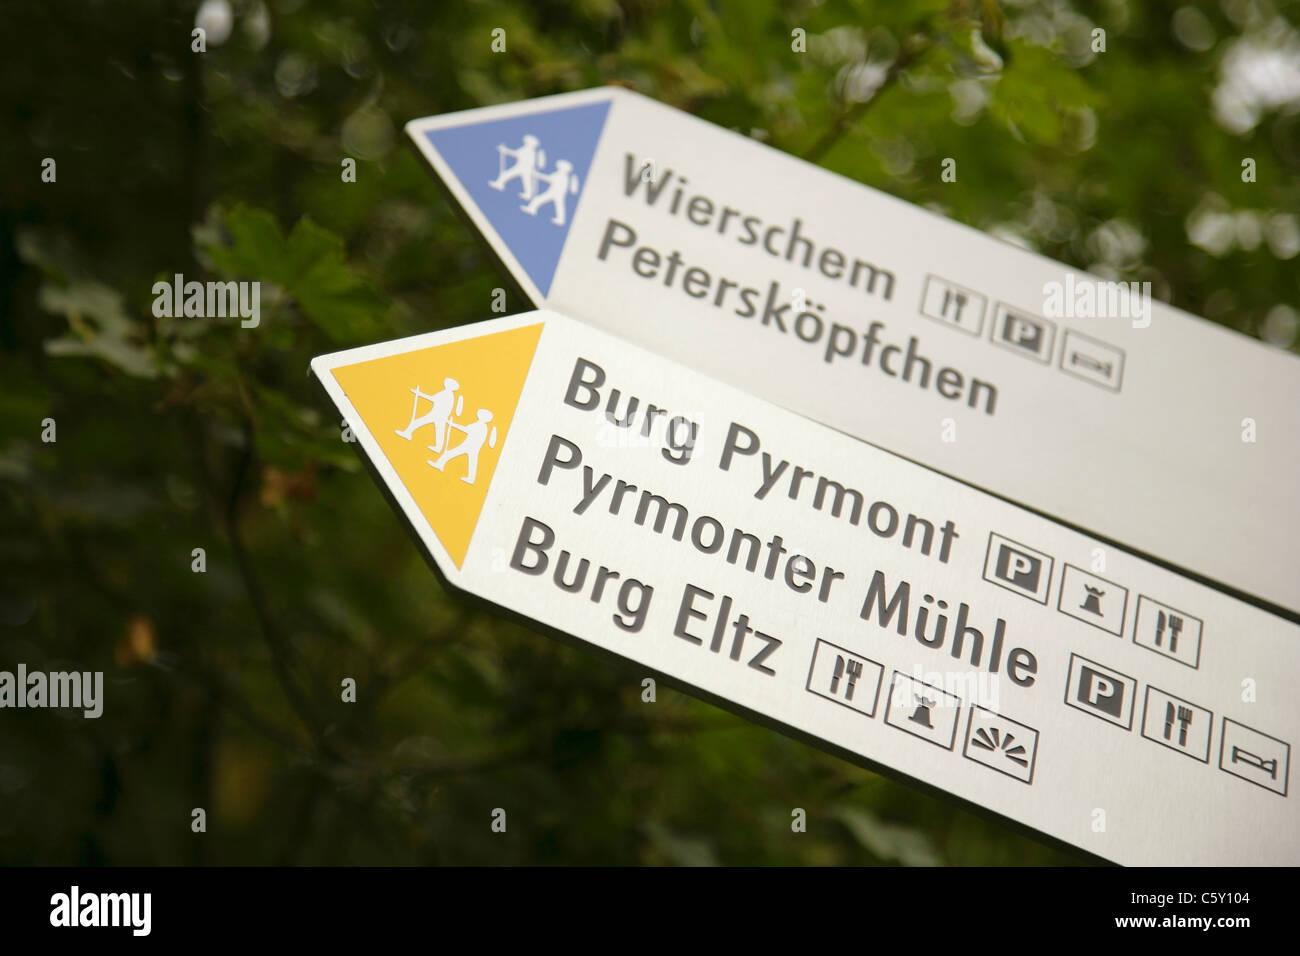 Sign on footpath leading to Burg Eltz castle, Rheinland-Pfalz, Germany. - Stock Image